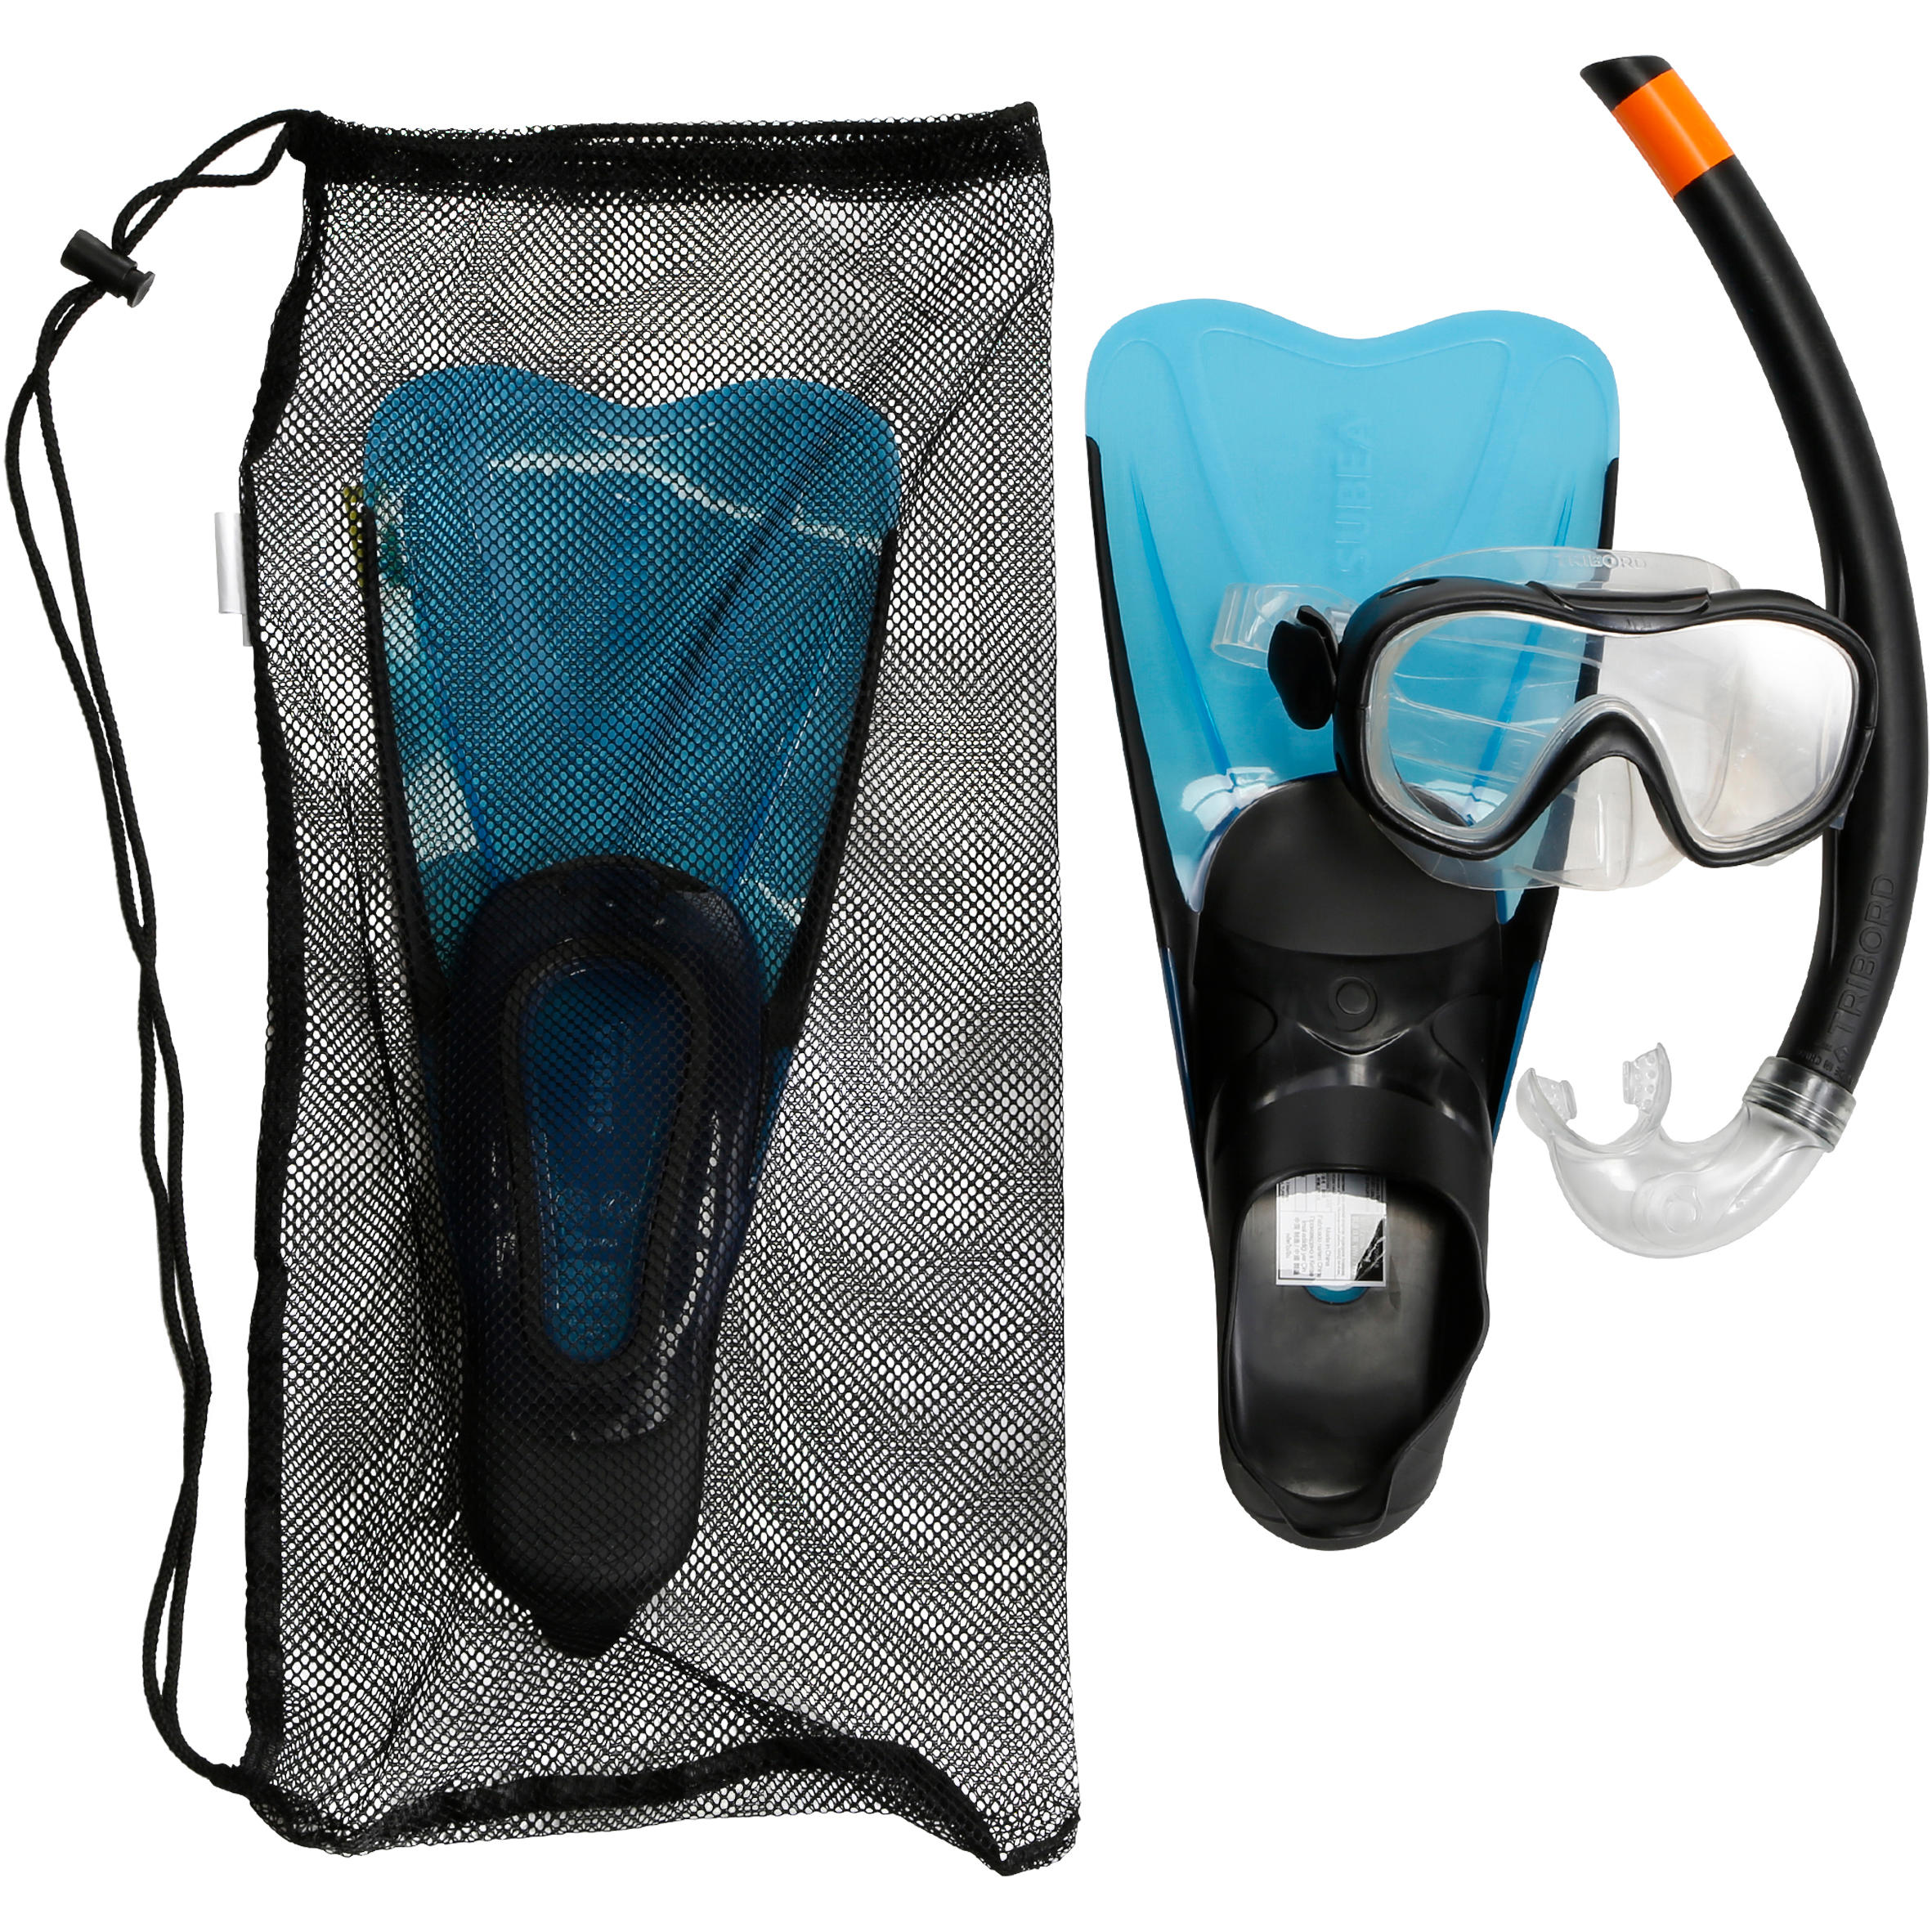 Kit de snorkeling Caraibes 100 Niños azul negro